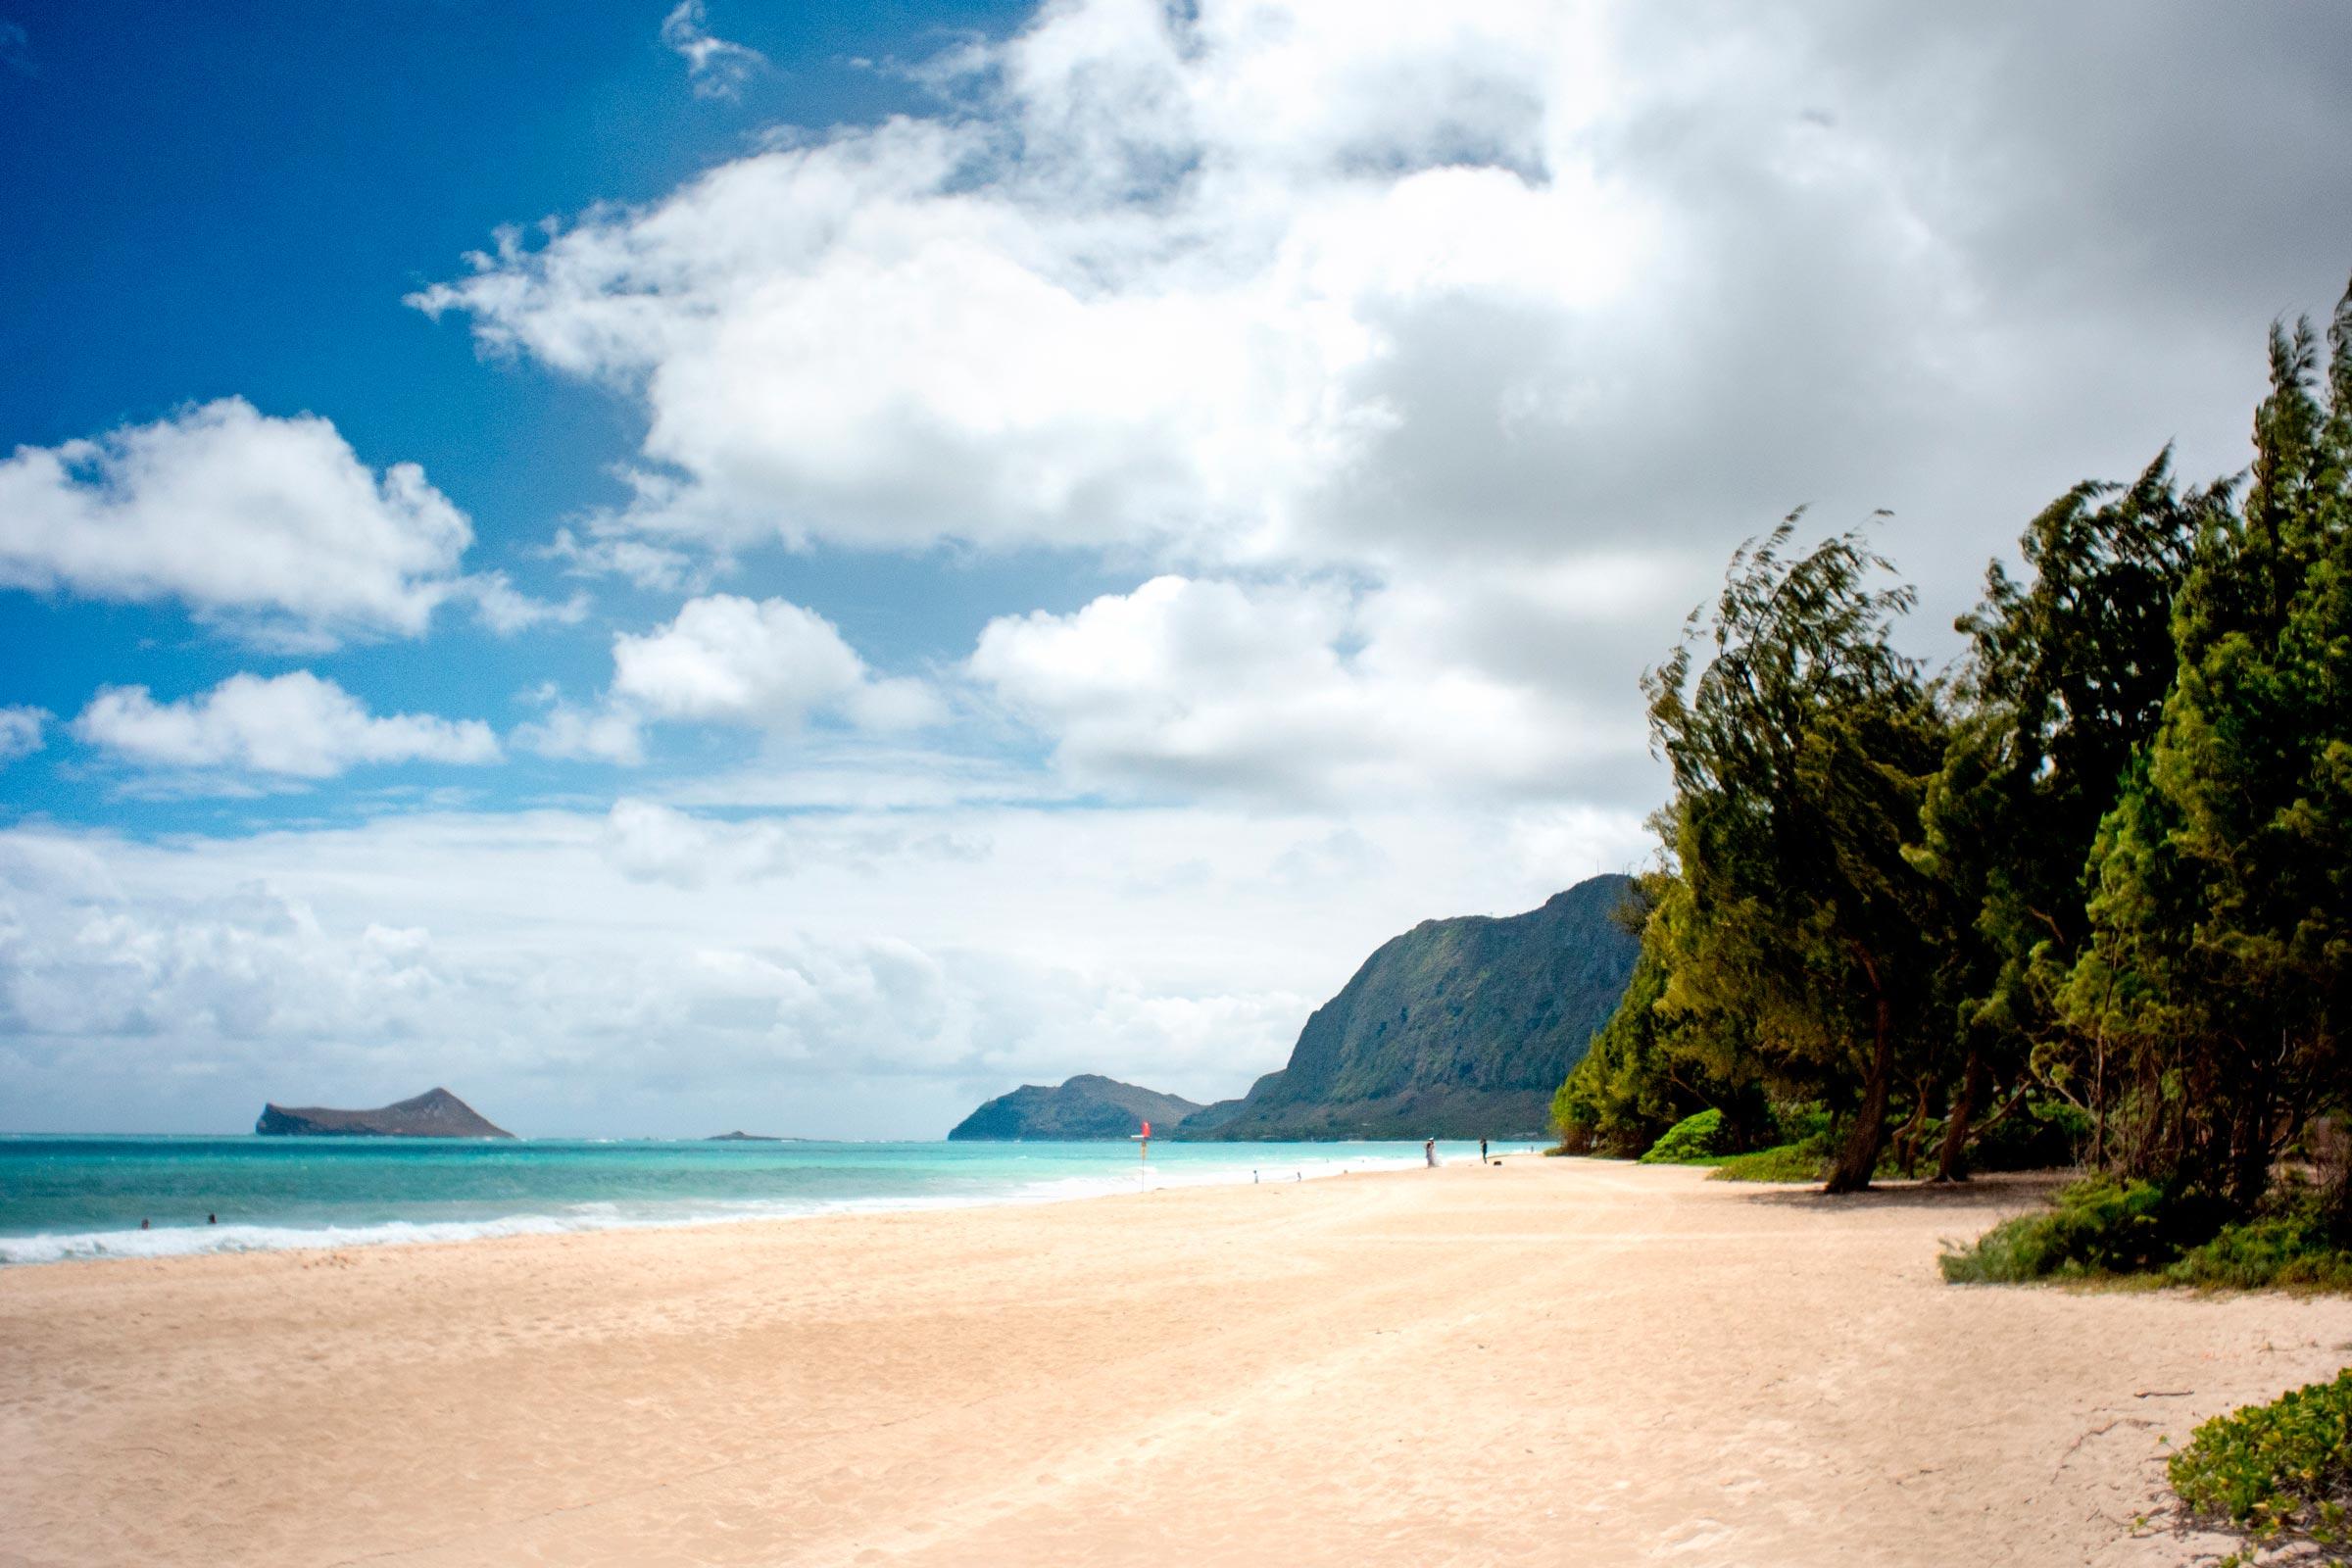 7-11: HAWAII NEIGHBORHOOD GUIDES - A glimpse into the distinct neighborhoods of the islands.